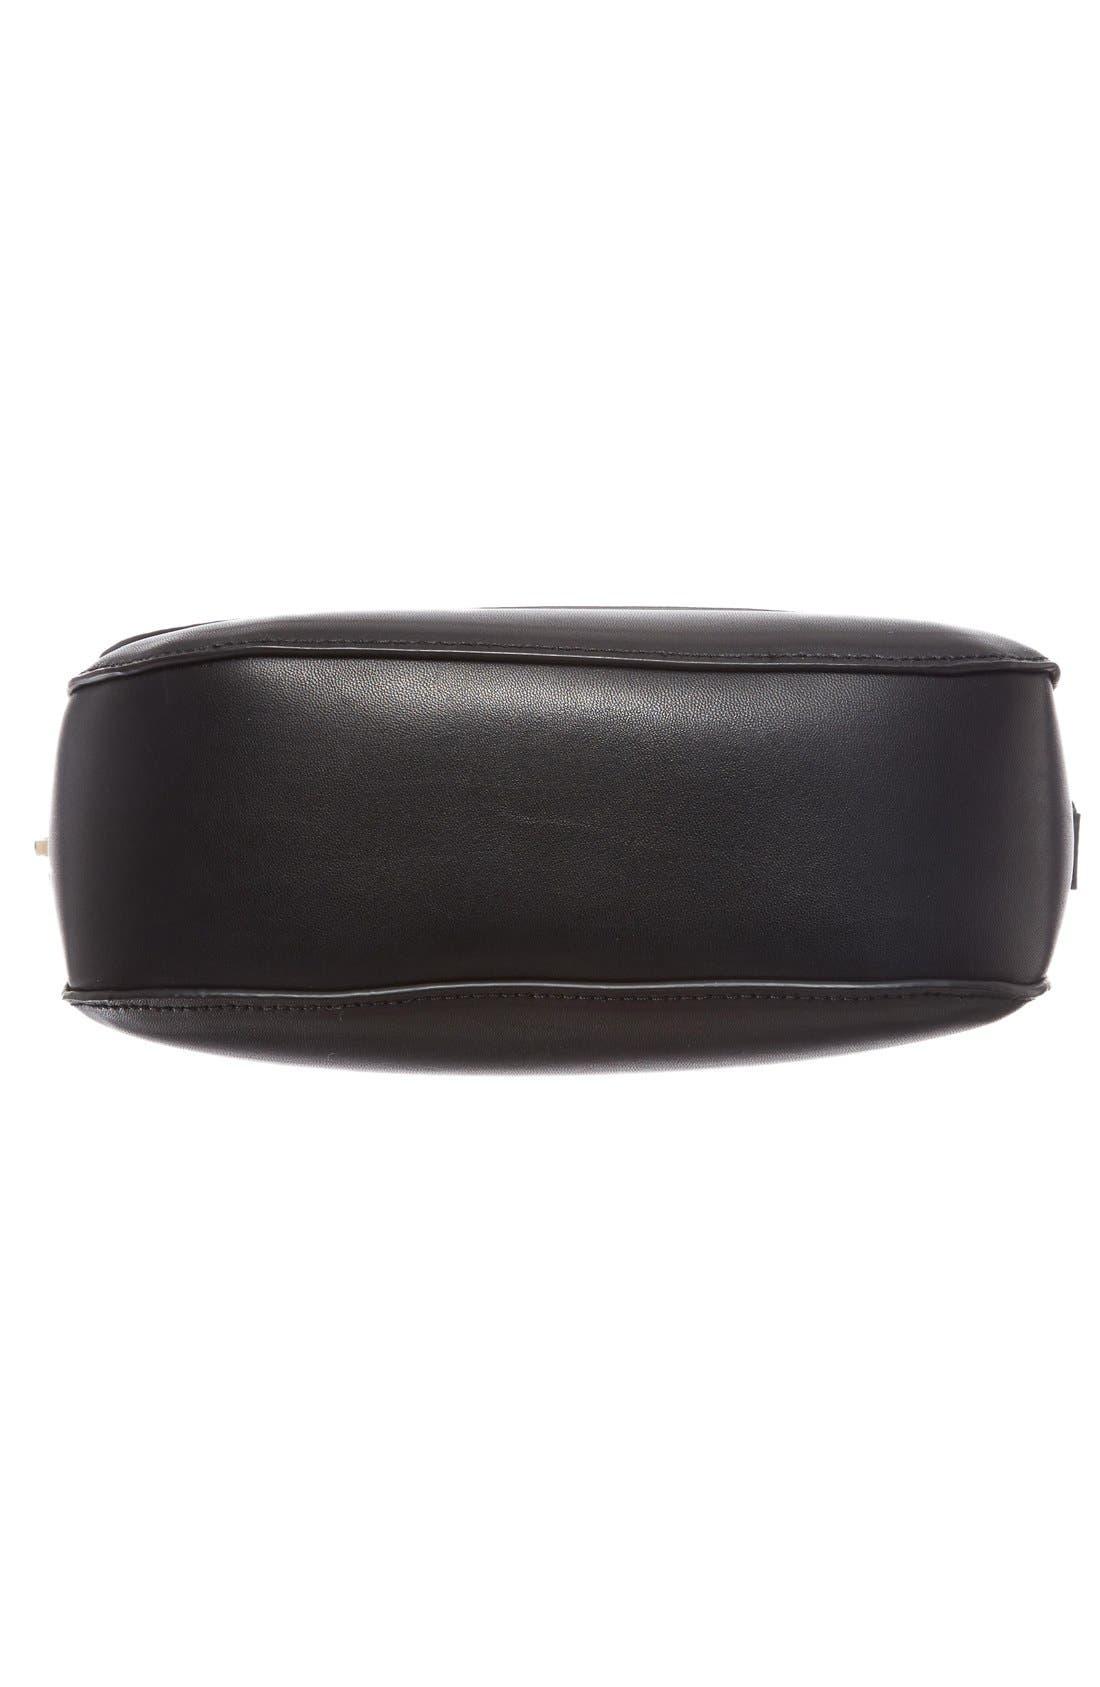 Minimal Faux Leather Crossbody Bag,                             Alternate thumbnail 6, color,                             001